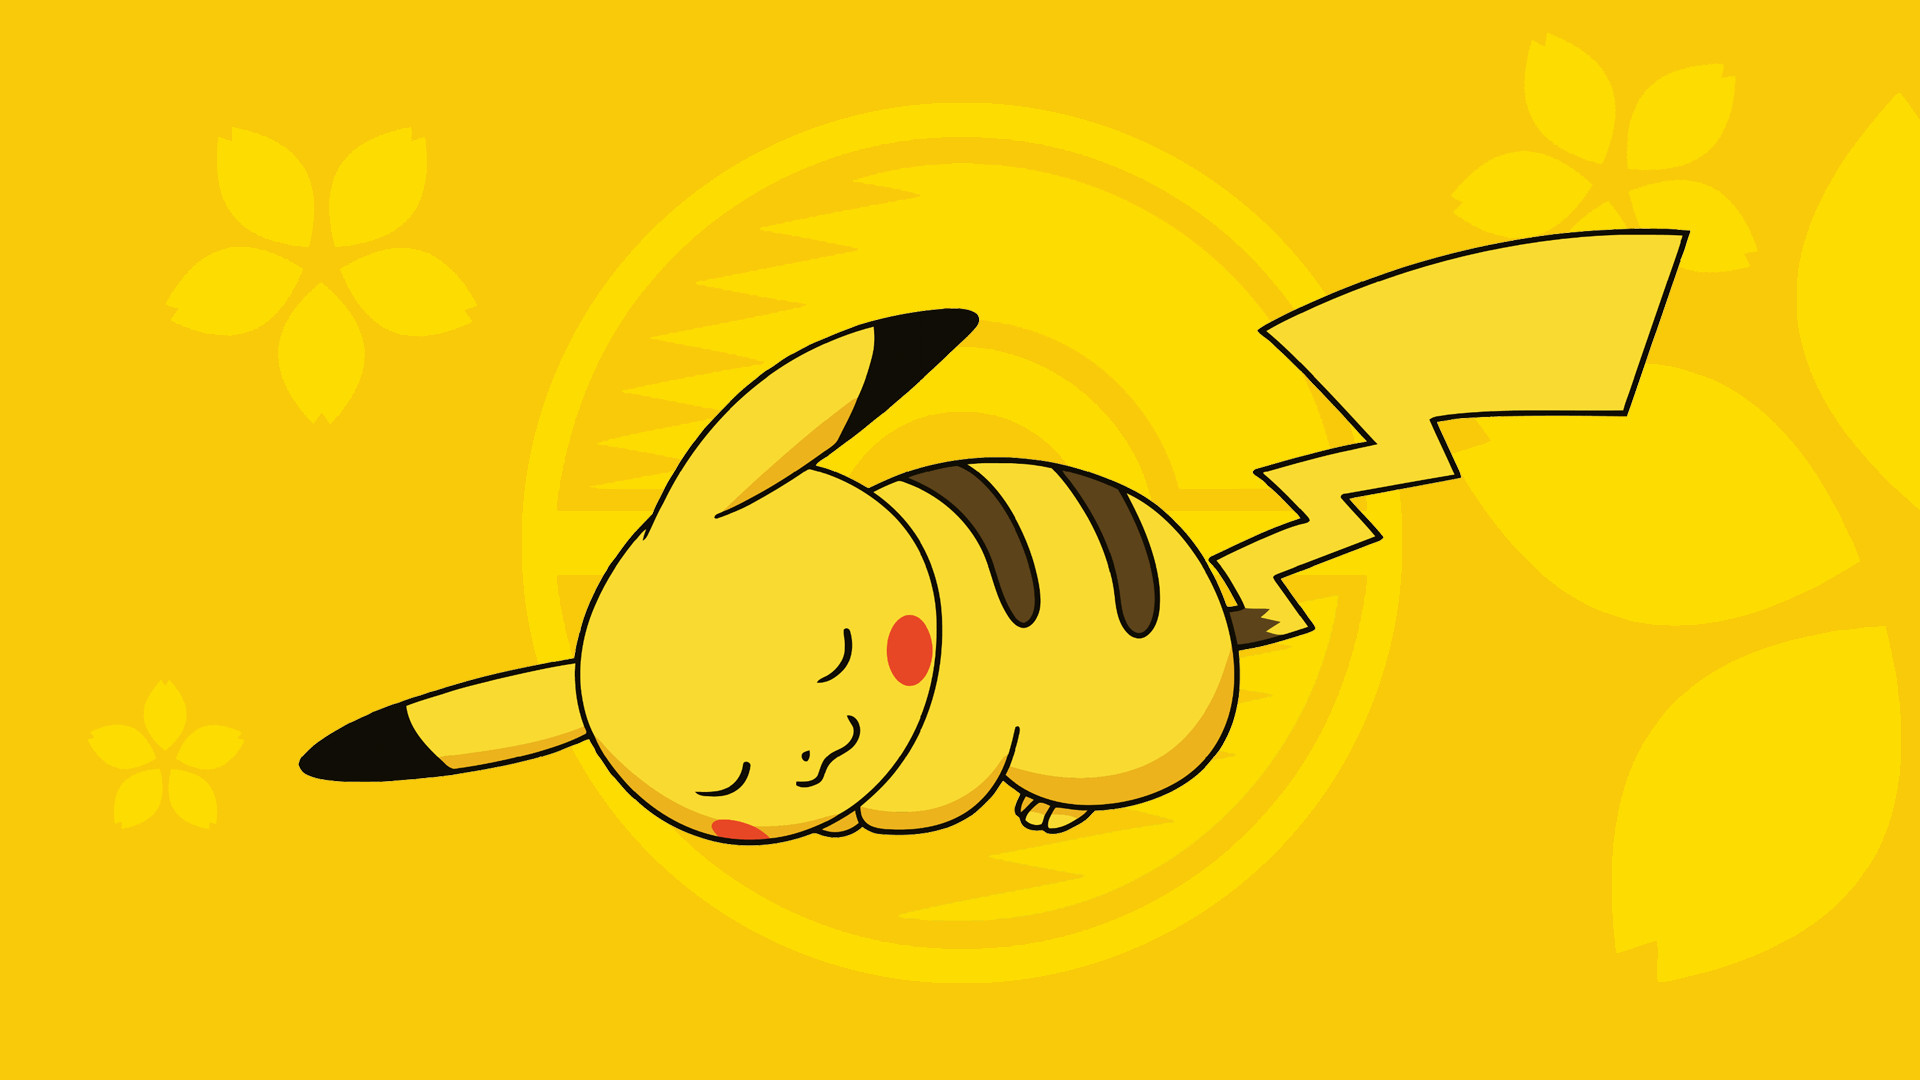 Cute Pikachu Wallpapers – Wallpaper Cave